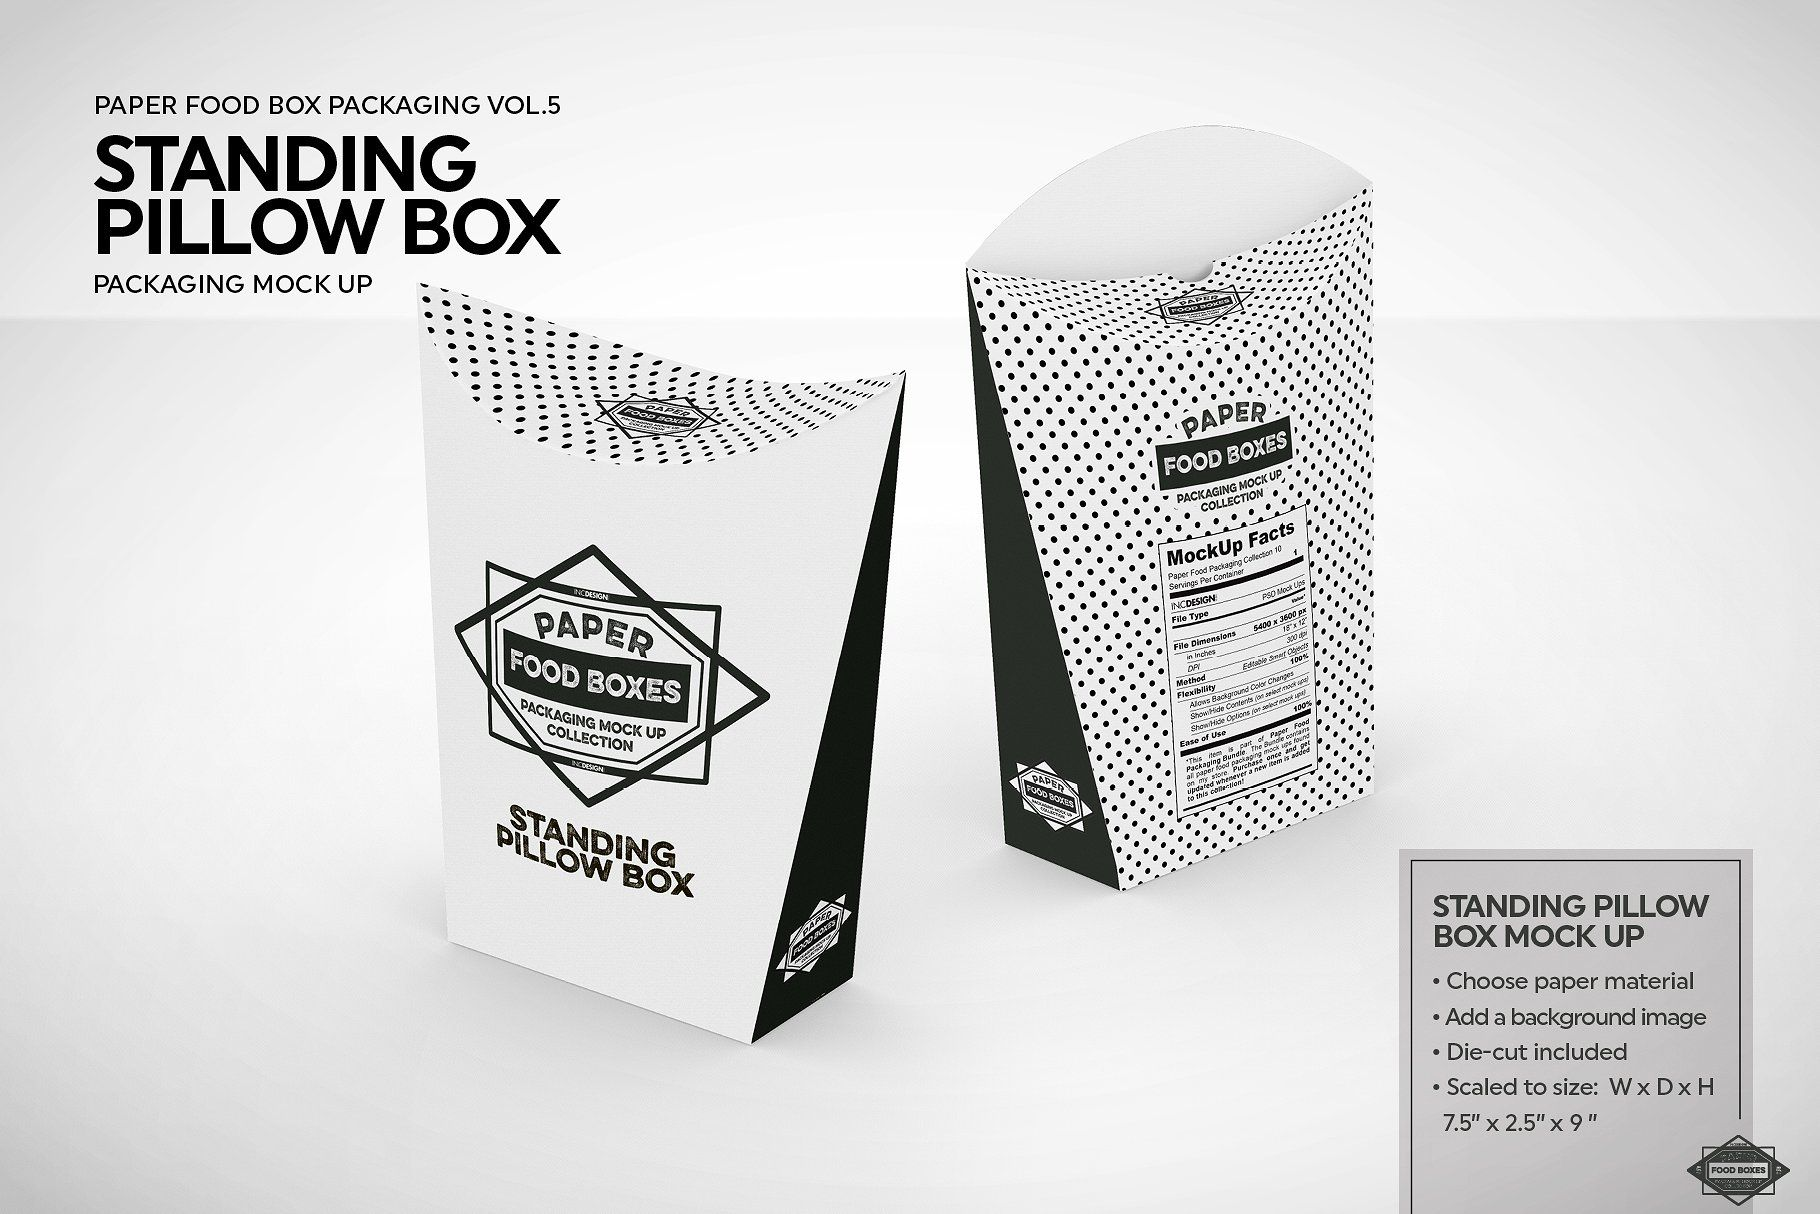 Standing Pillow Box Packaging Mockup Packaging Mockup Free Packaging Mockup Pillow Box